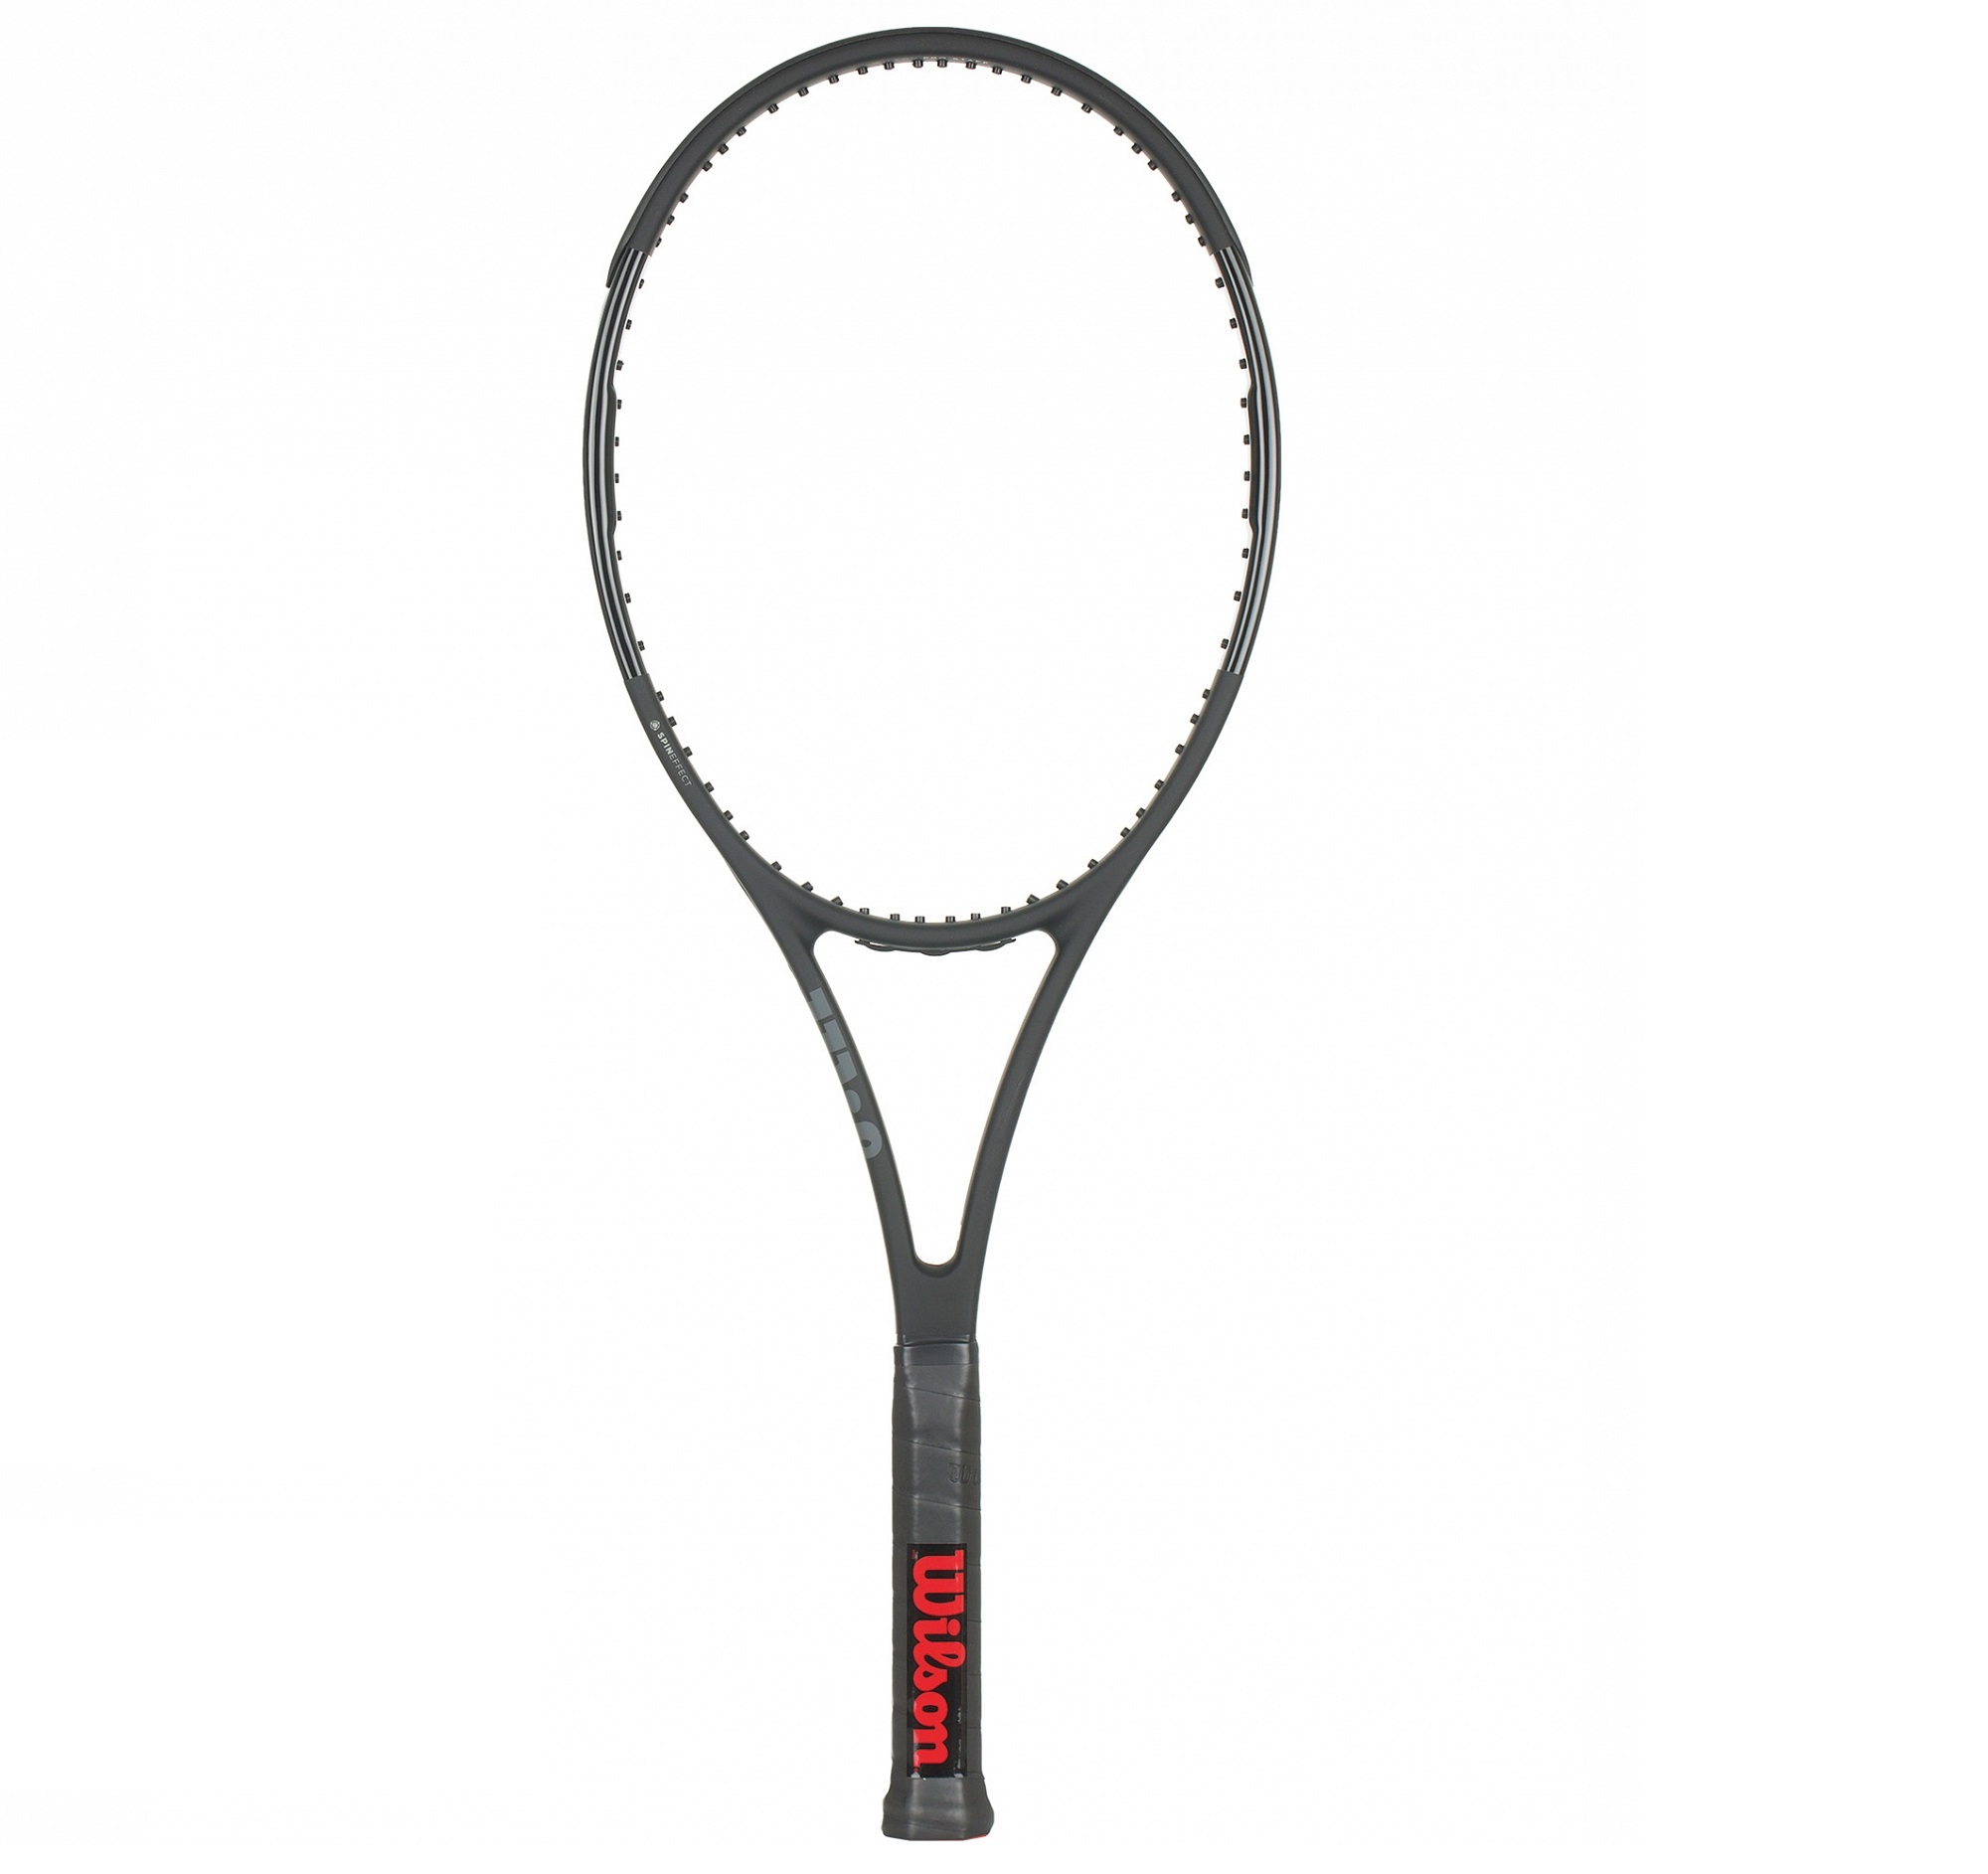 Wilson Ракетка для большого тенниса Wilson Pro Staff 97LS сетки для тенниса большого